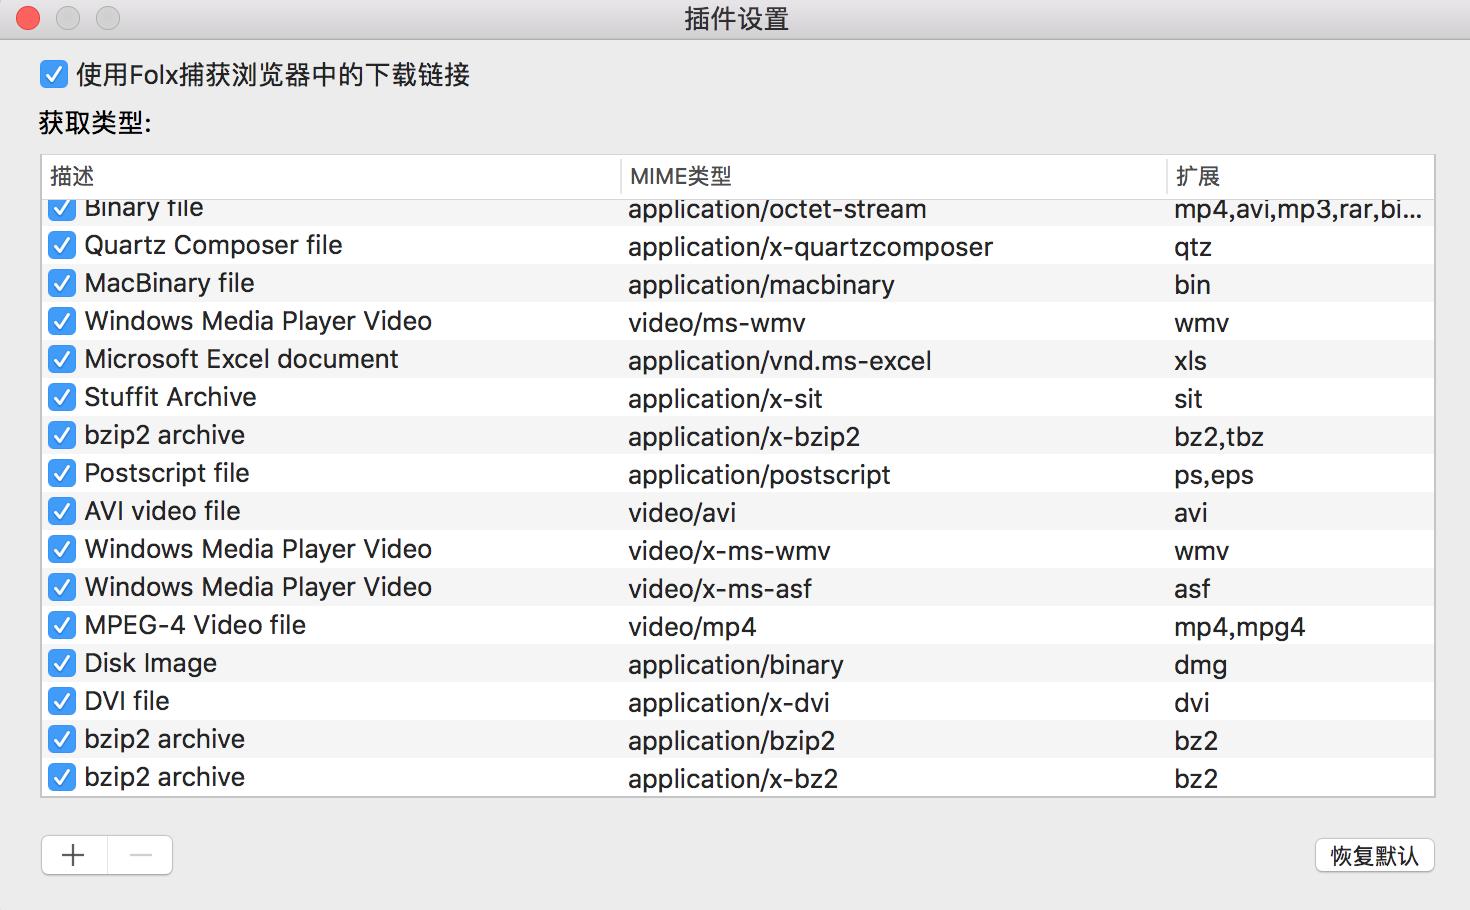 /Users/niruiyang/Desktop/屏幕快照 2021-04-13 16.32.13.png